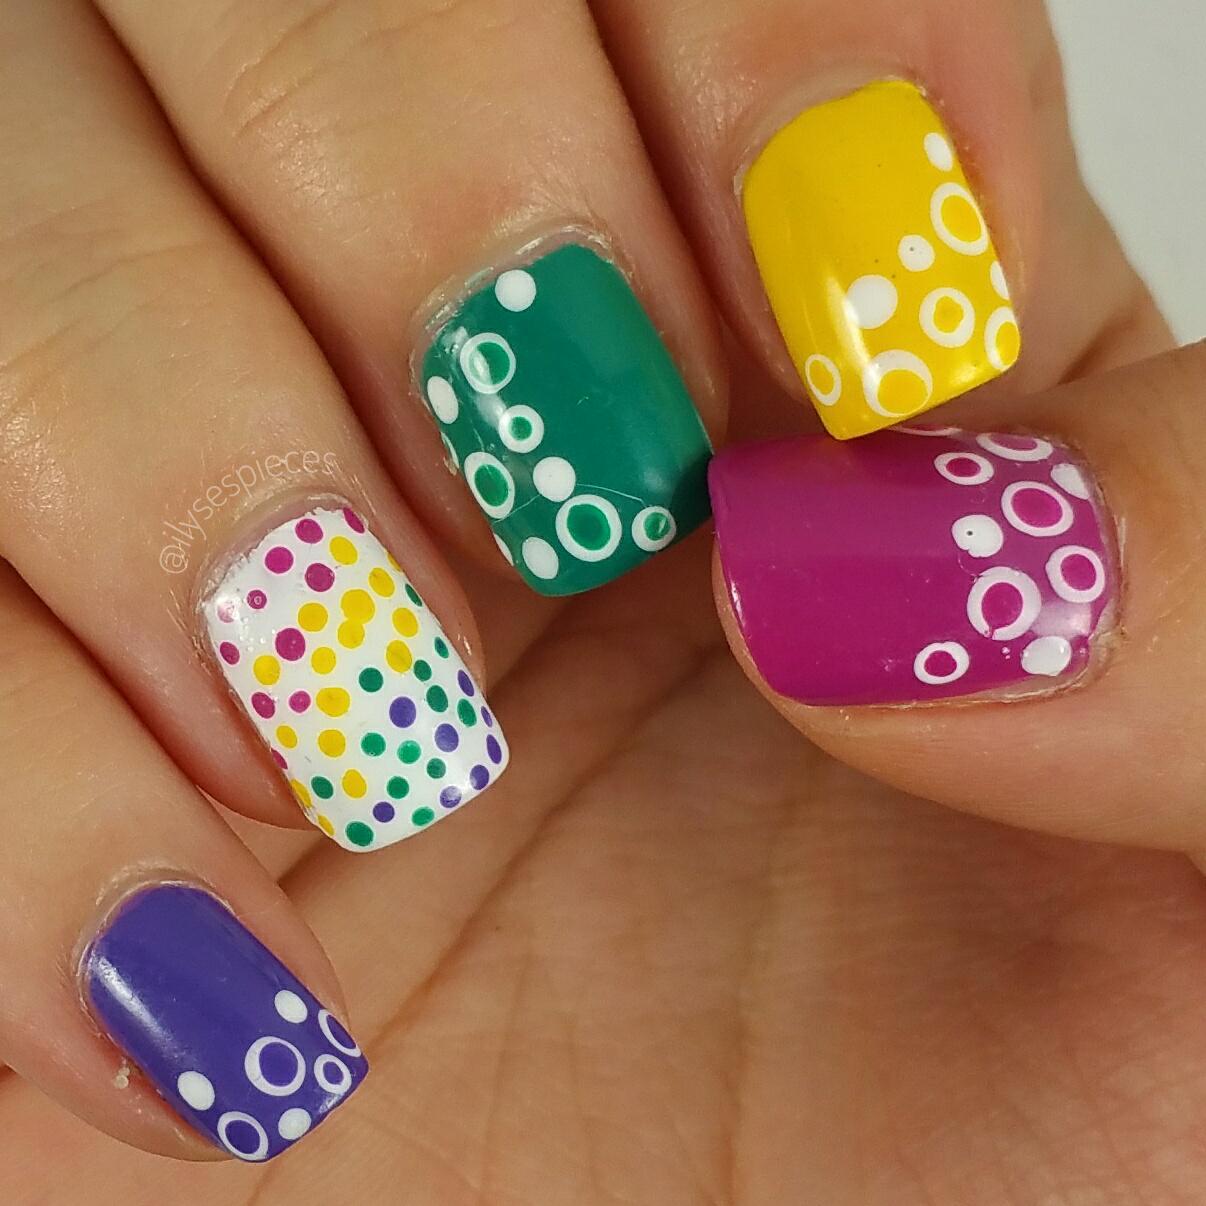 New nail shape! New Zoyas! - Imgur | Nails | Pinterest